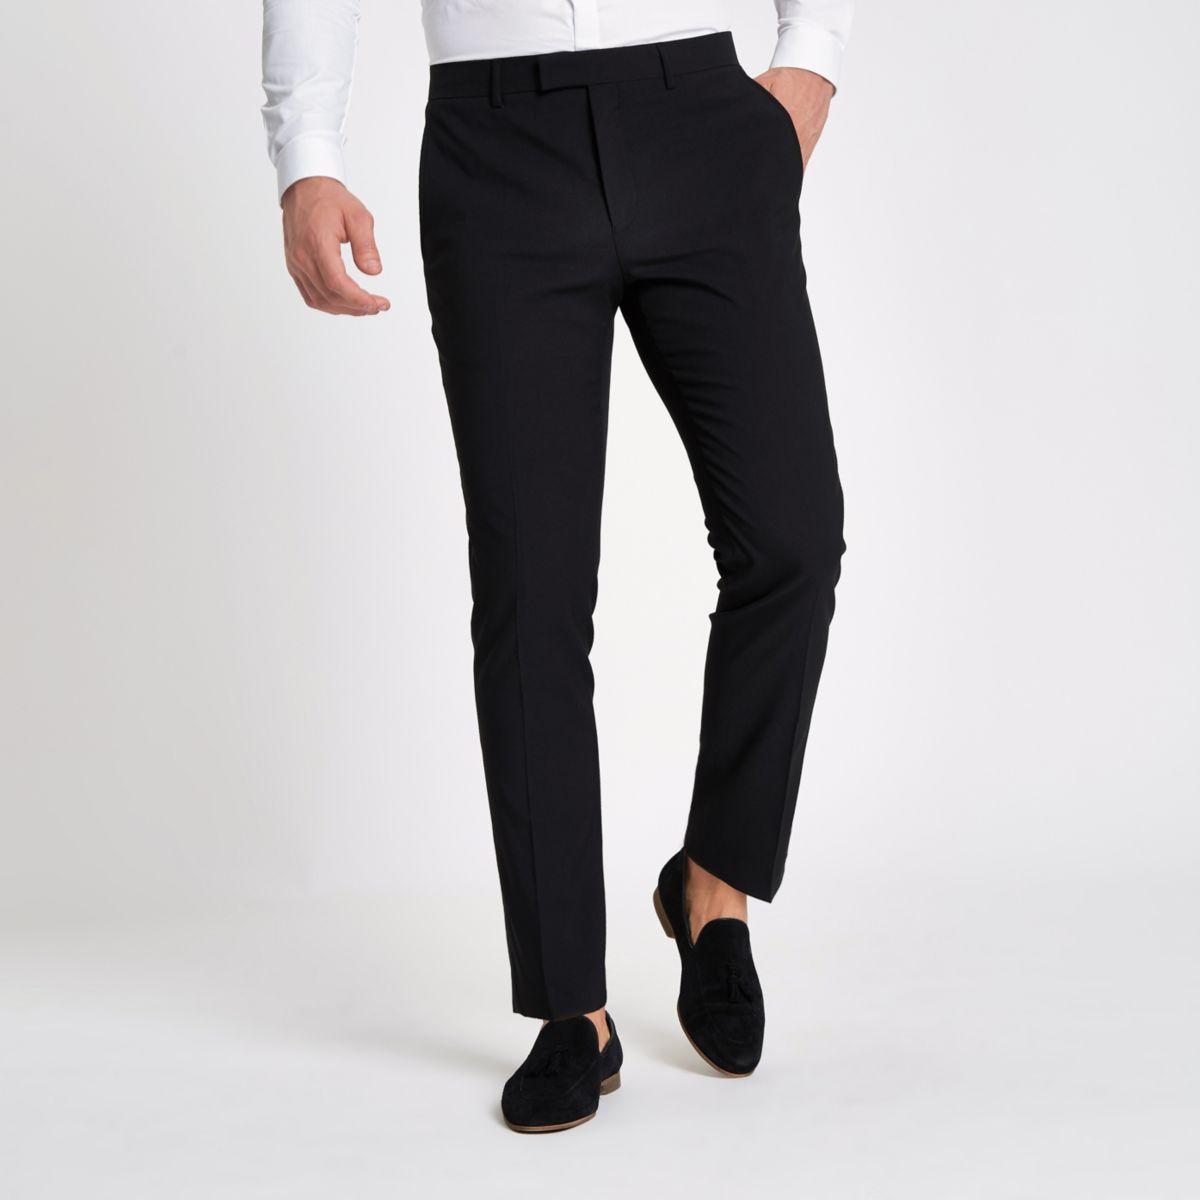 Zwarte skinny-fit pantalon